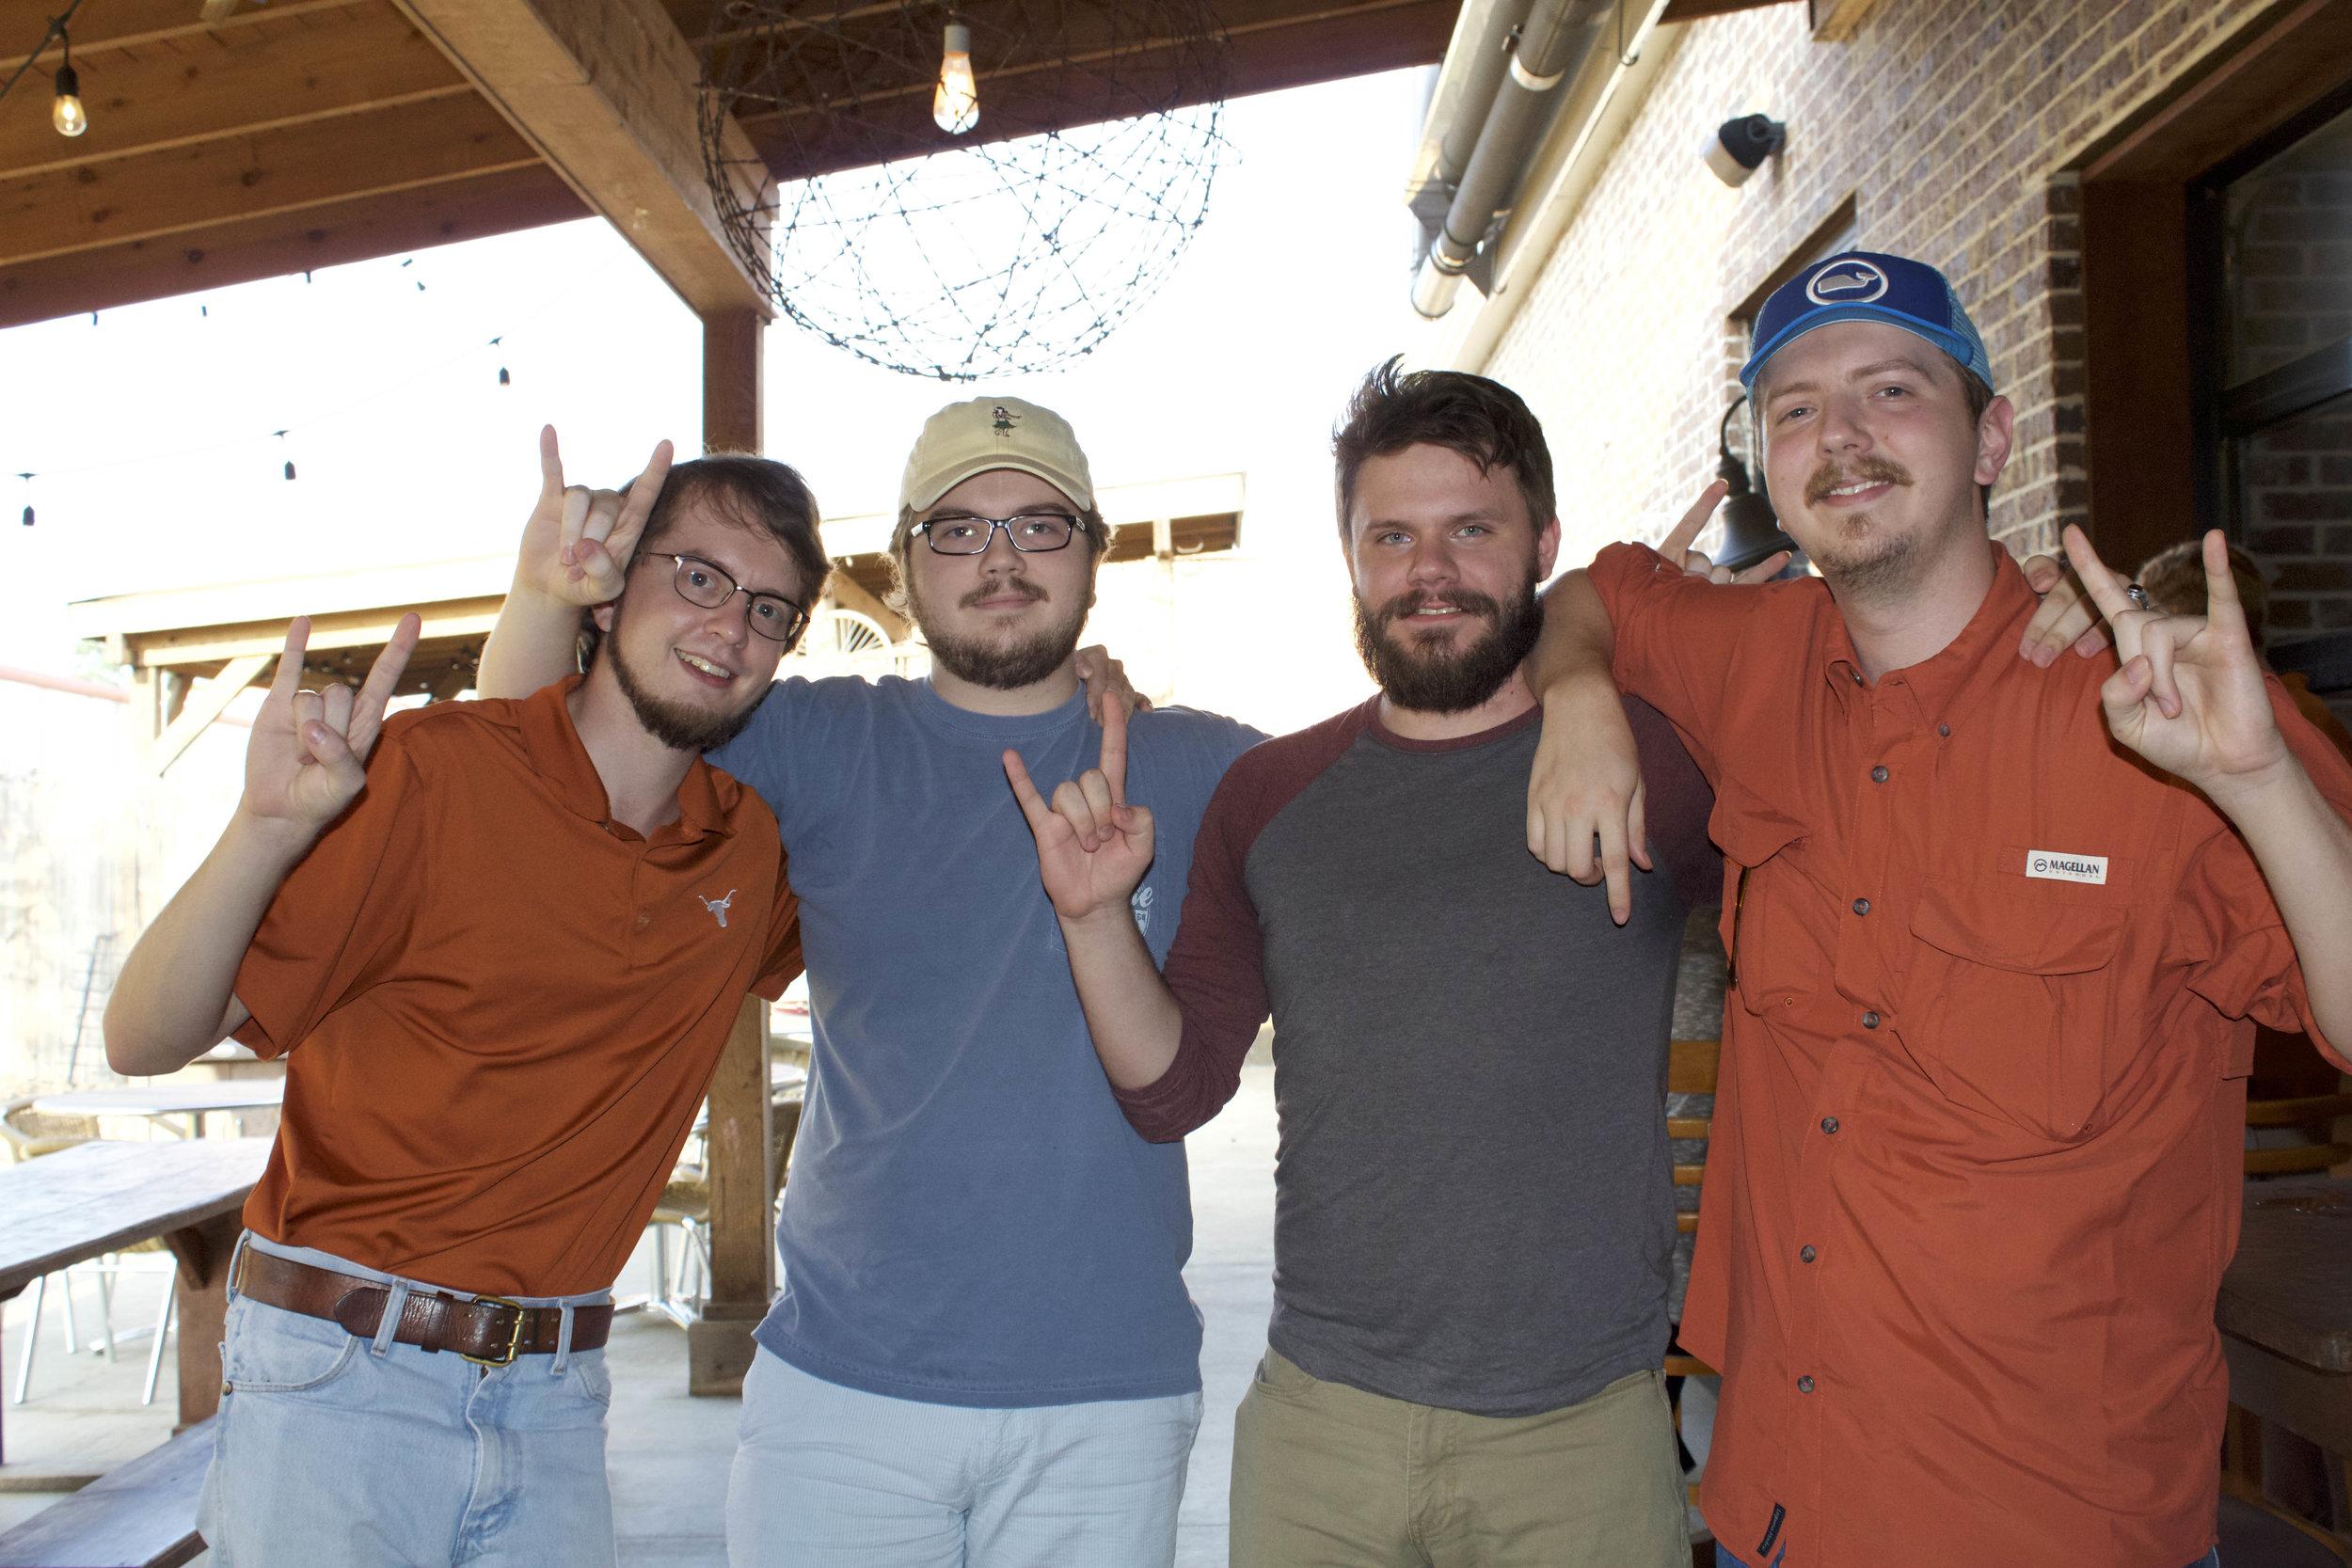 Mark Northam, Ben Northam, Nathaniel Hurst and Adam Northam